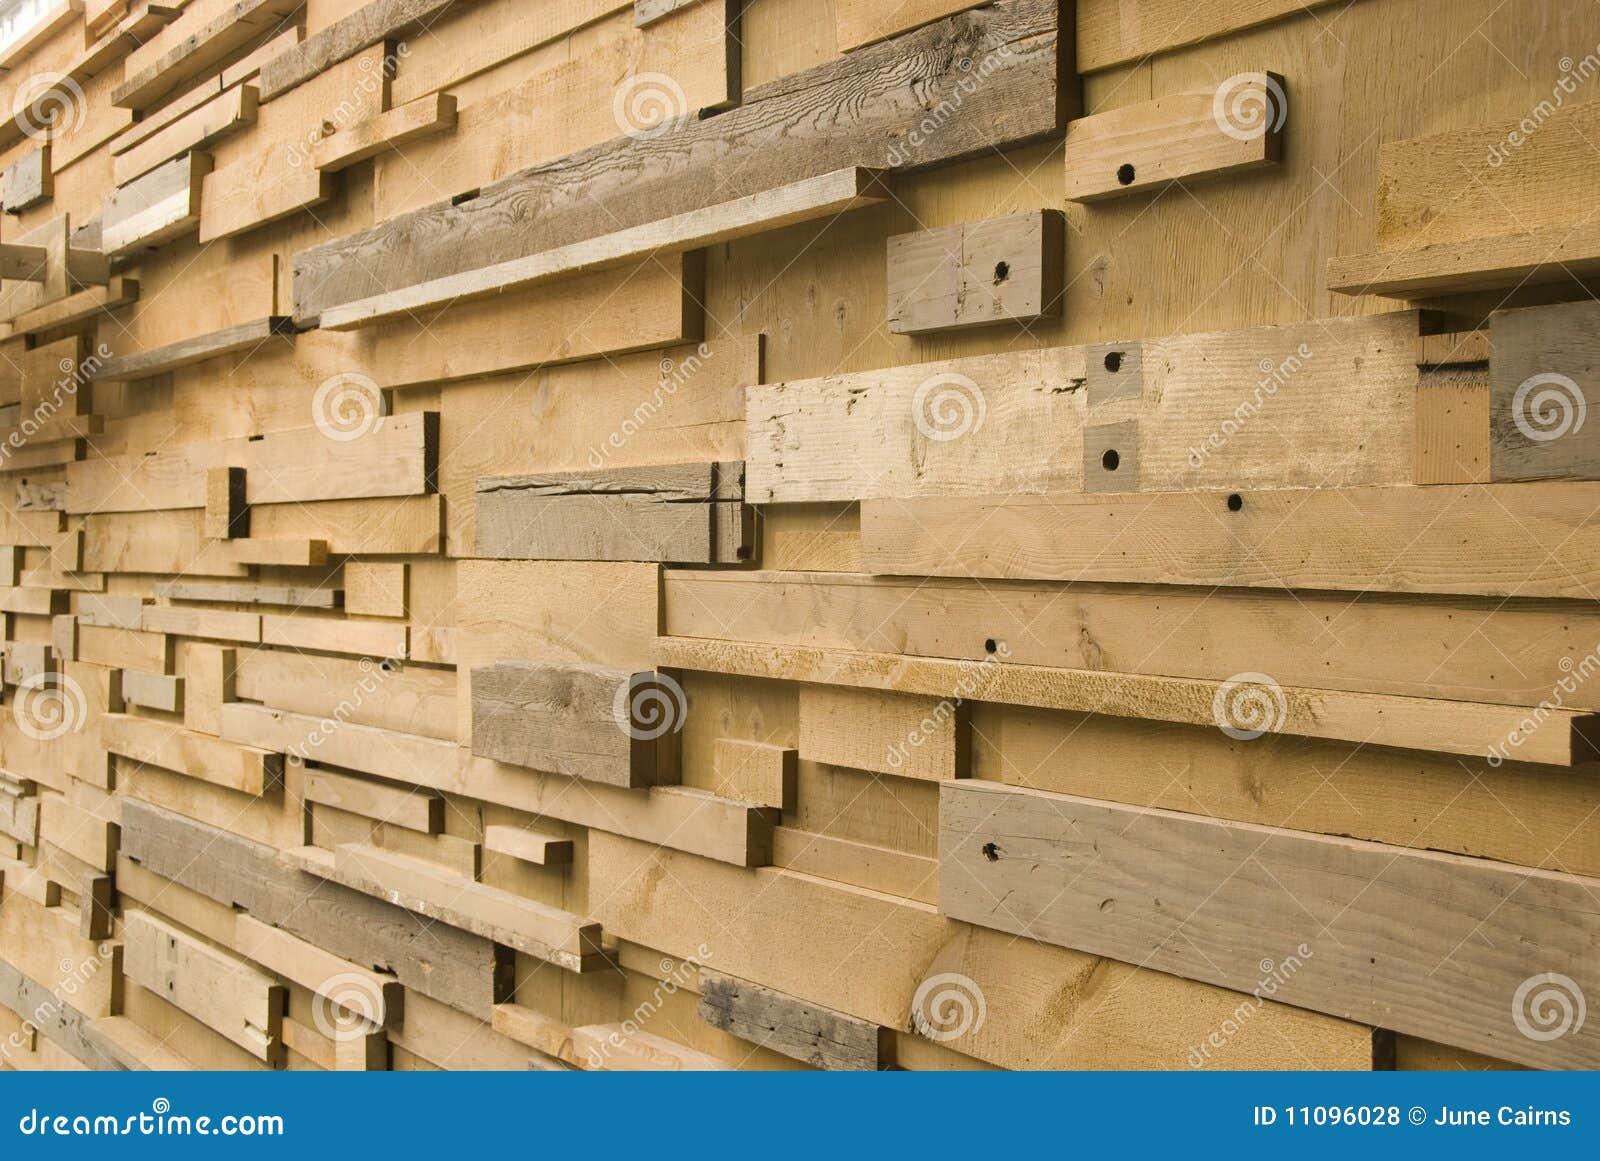 Muur van hout stock foto afbeelding bestaande uit muur 11096028 - Muur van de ingang ...